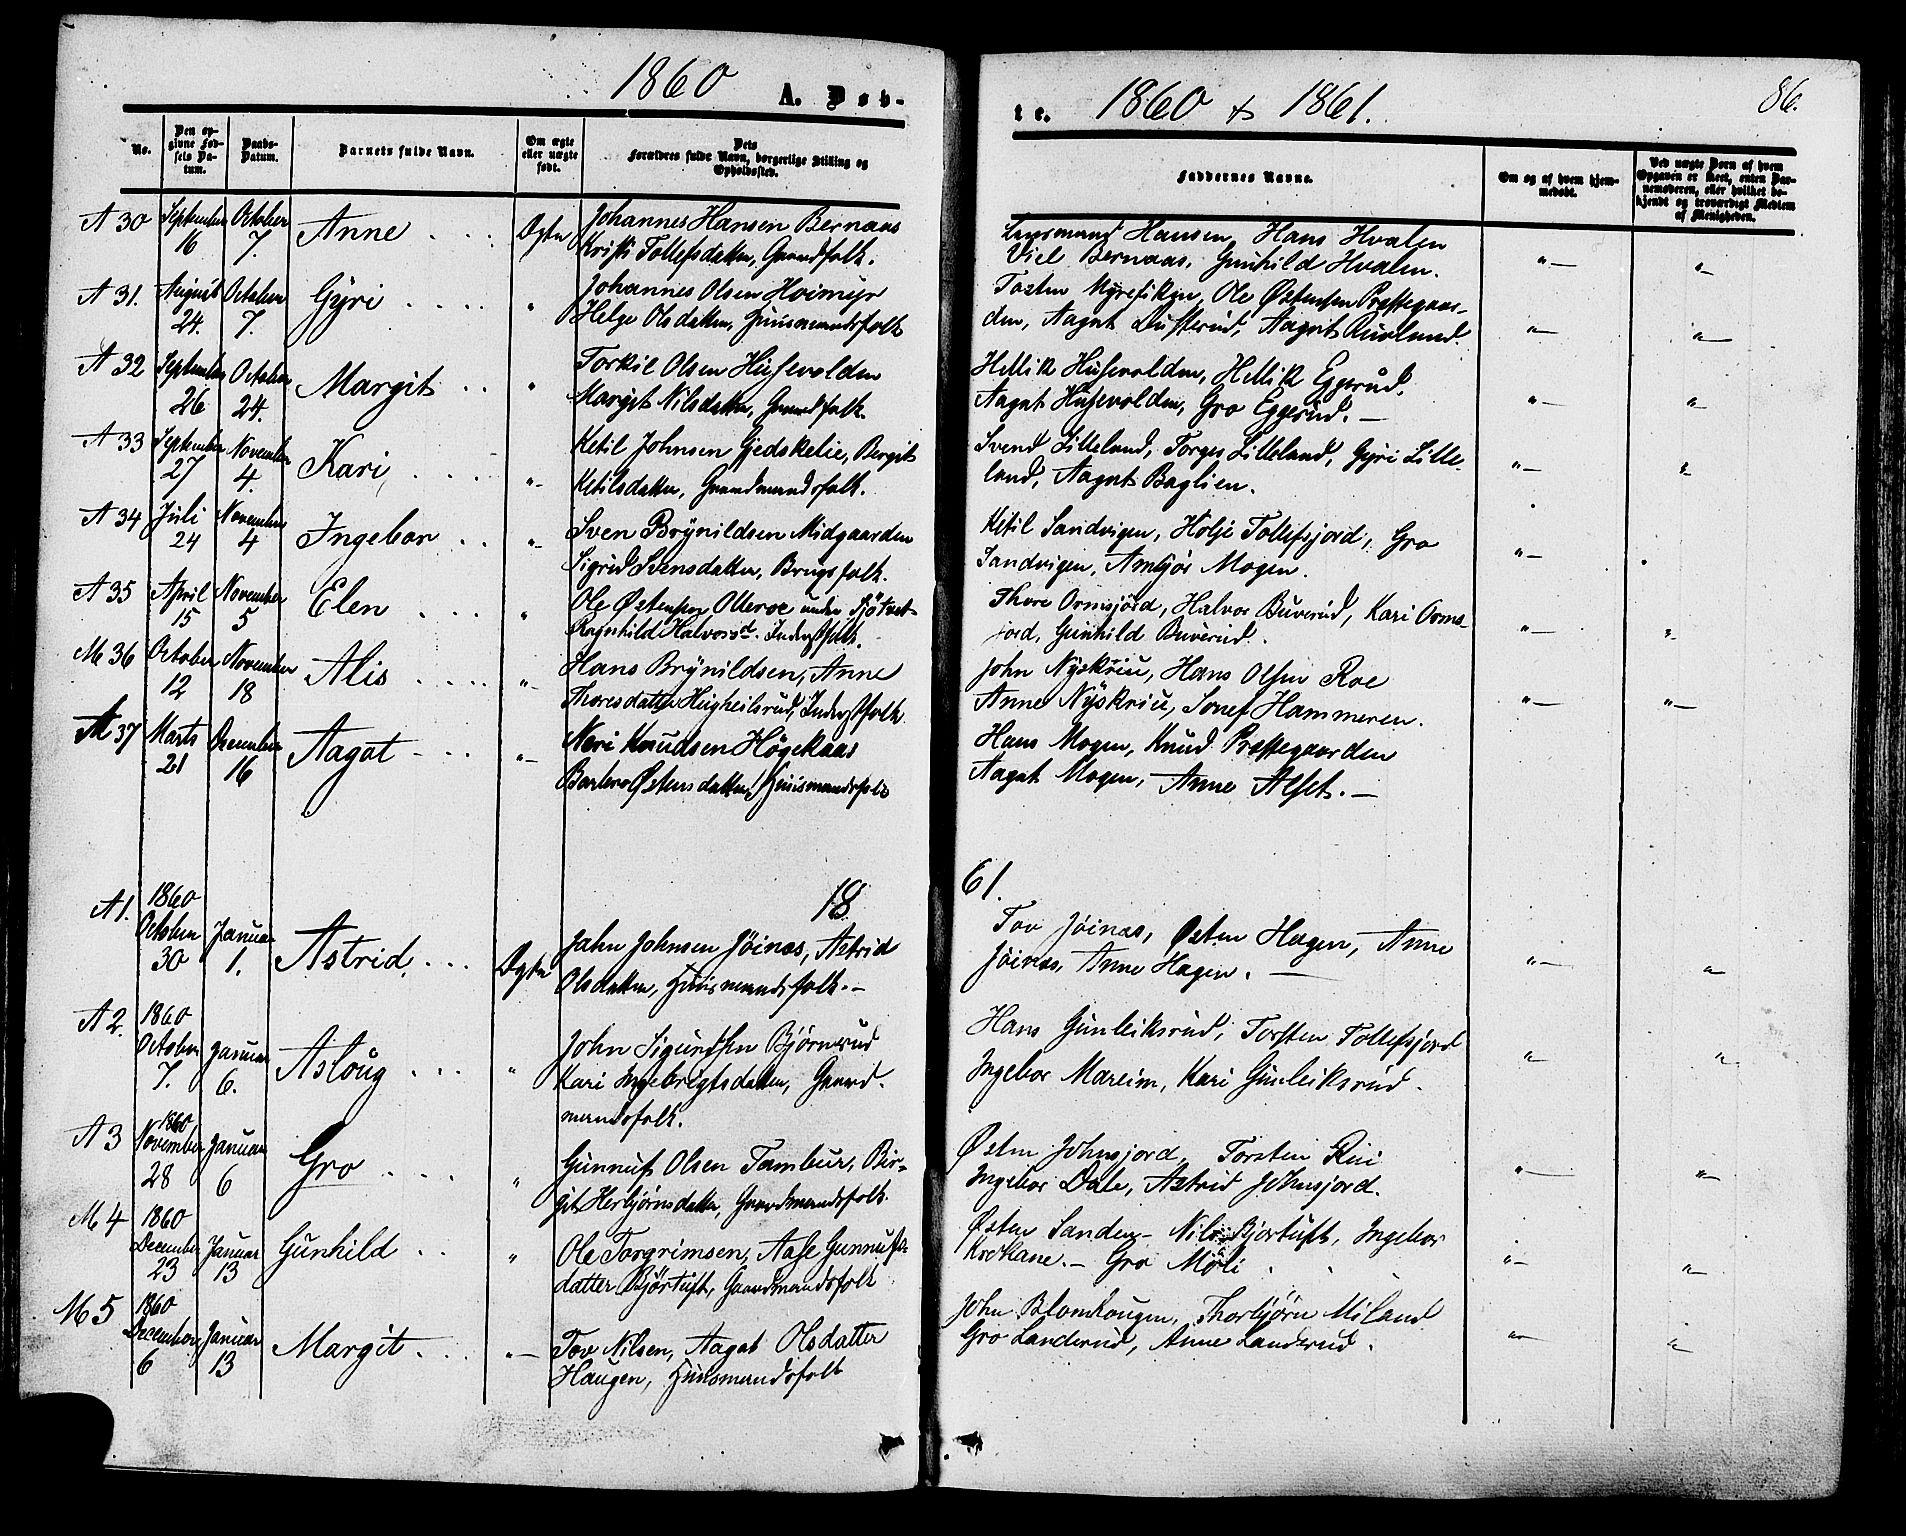 SAKO, Tinn kirkebøker, F/Fa/L0006: Ministerialbok nr. I 6, 1857-1878, s. 86